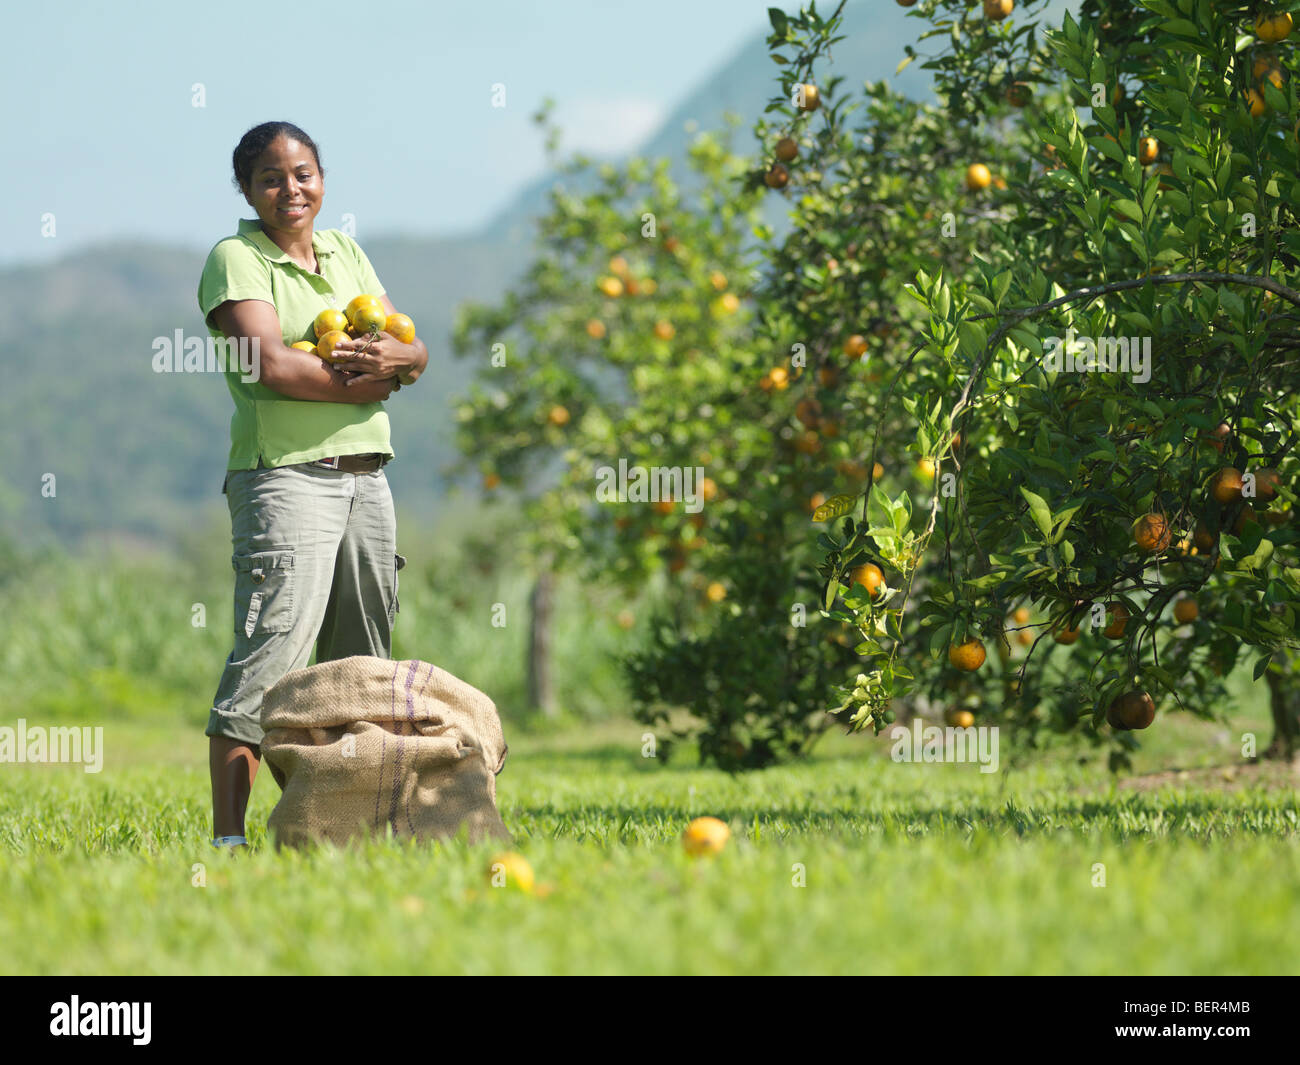 Female Worker Picking Oranges - Stock Image